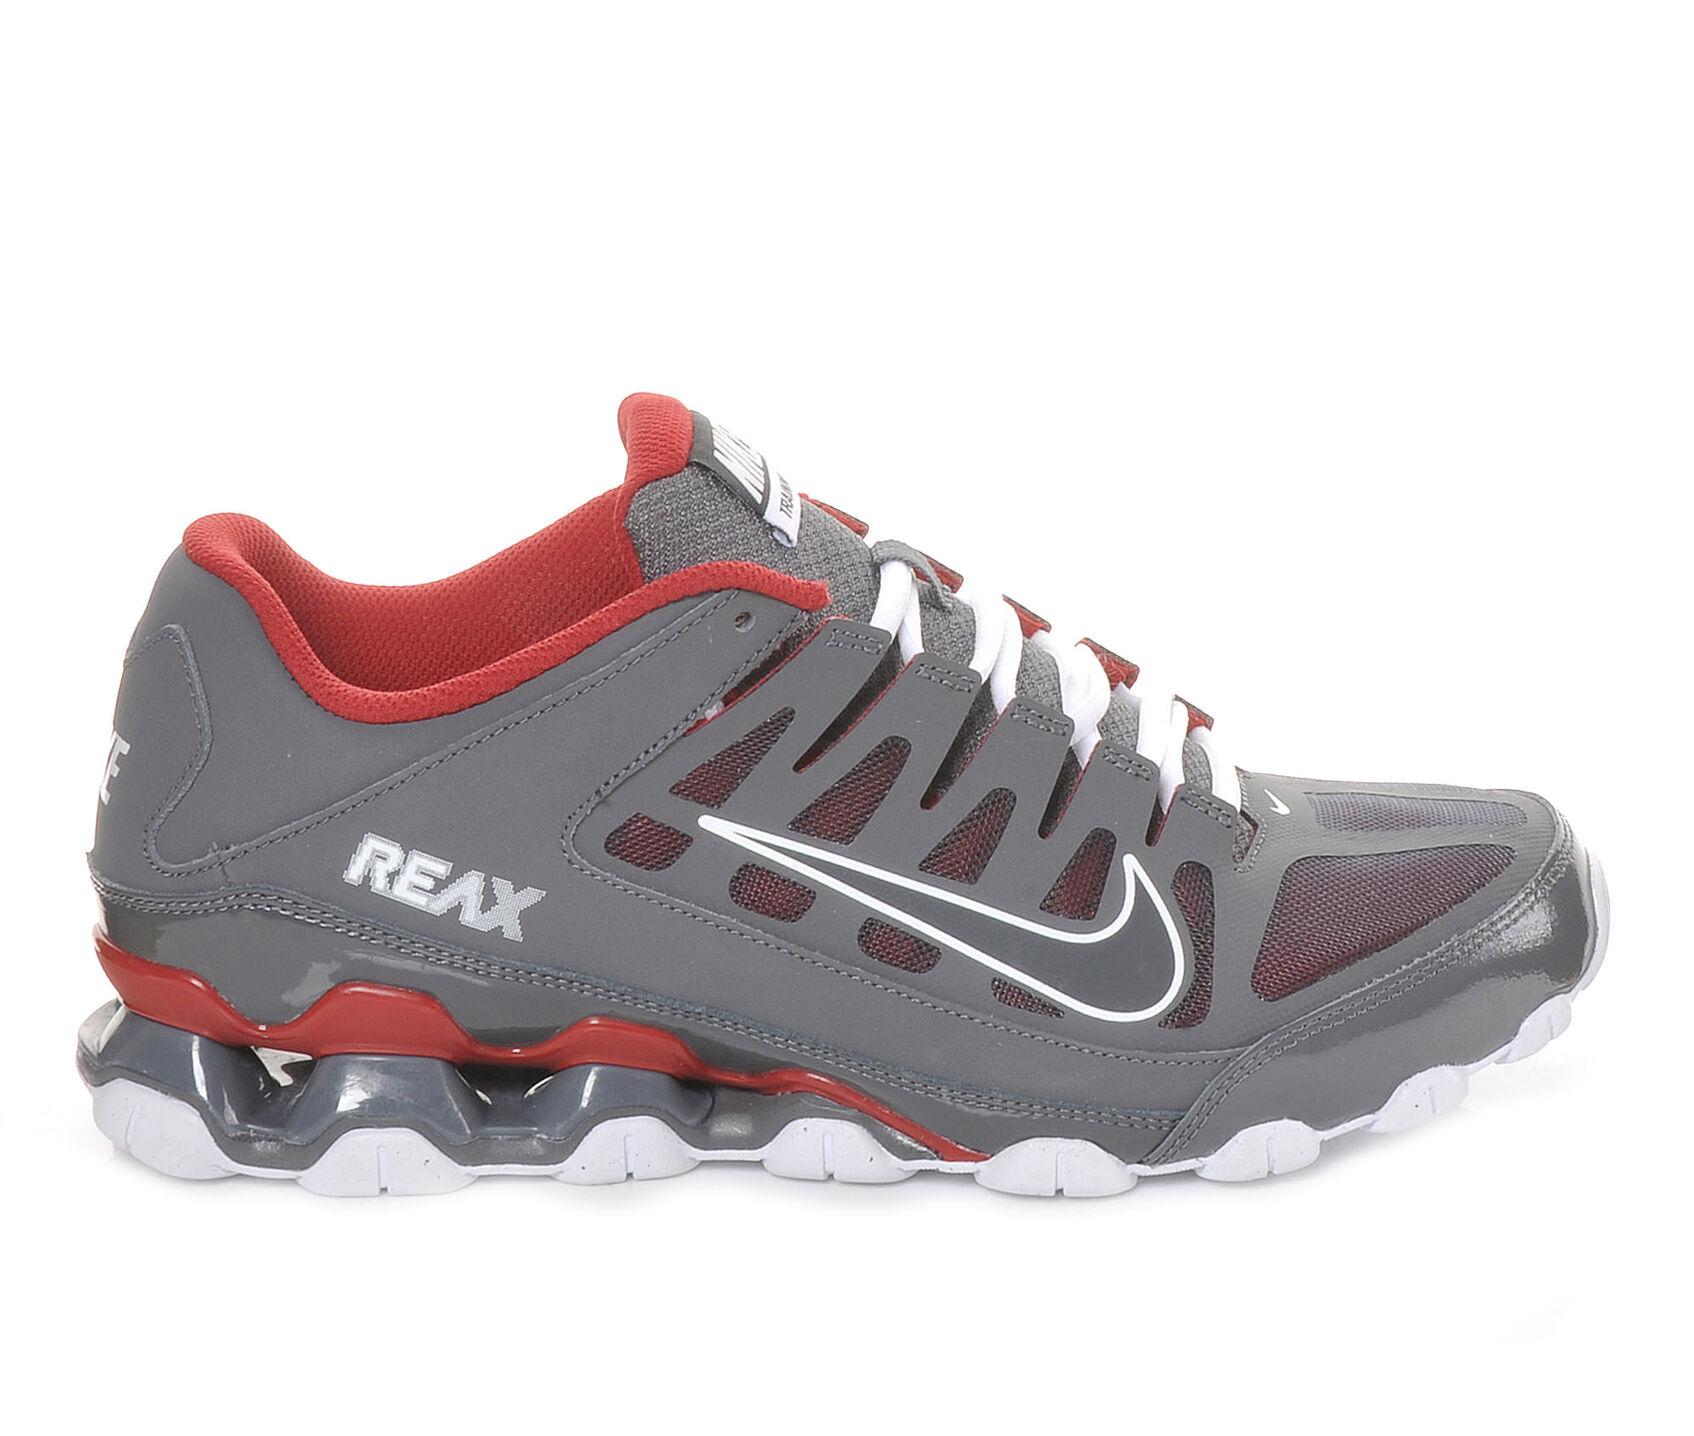 58185568de99 ... Nike Reax 8 TR Mesh Training Shoes. Previous